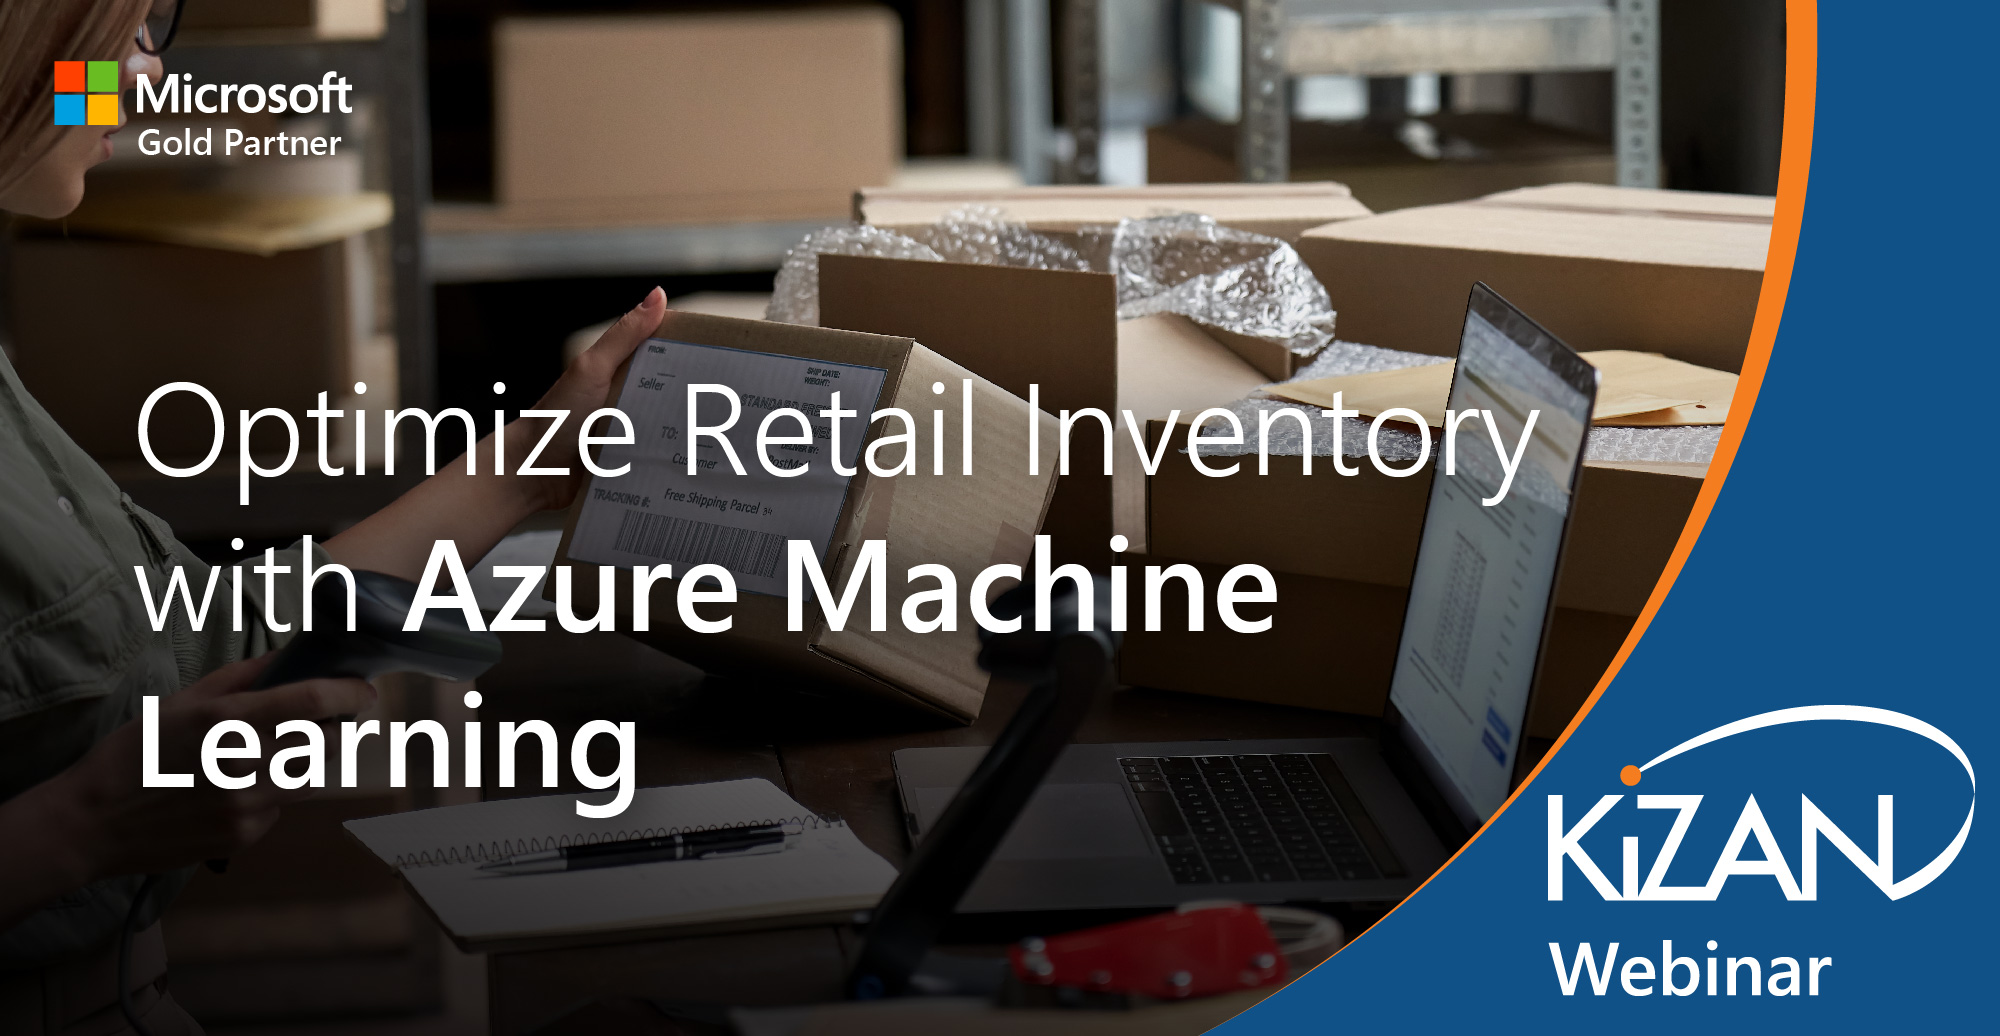 Azure Machine Learning Webinar Email Banner